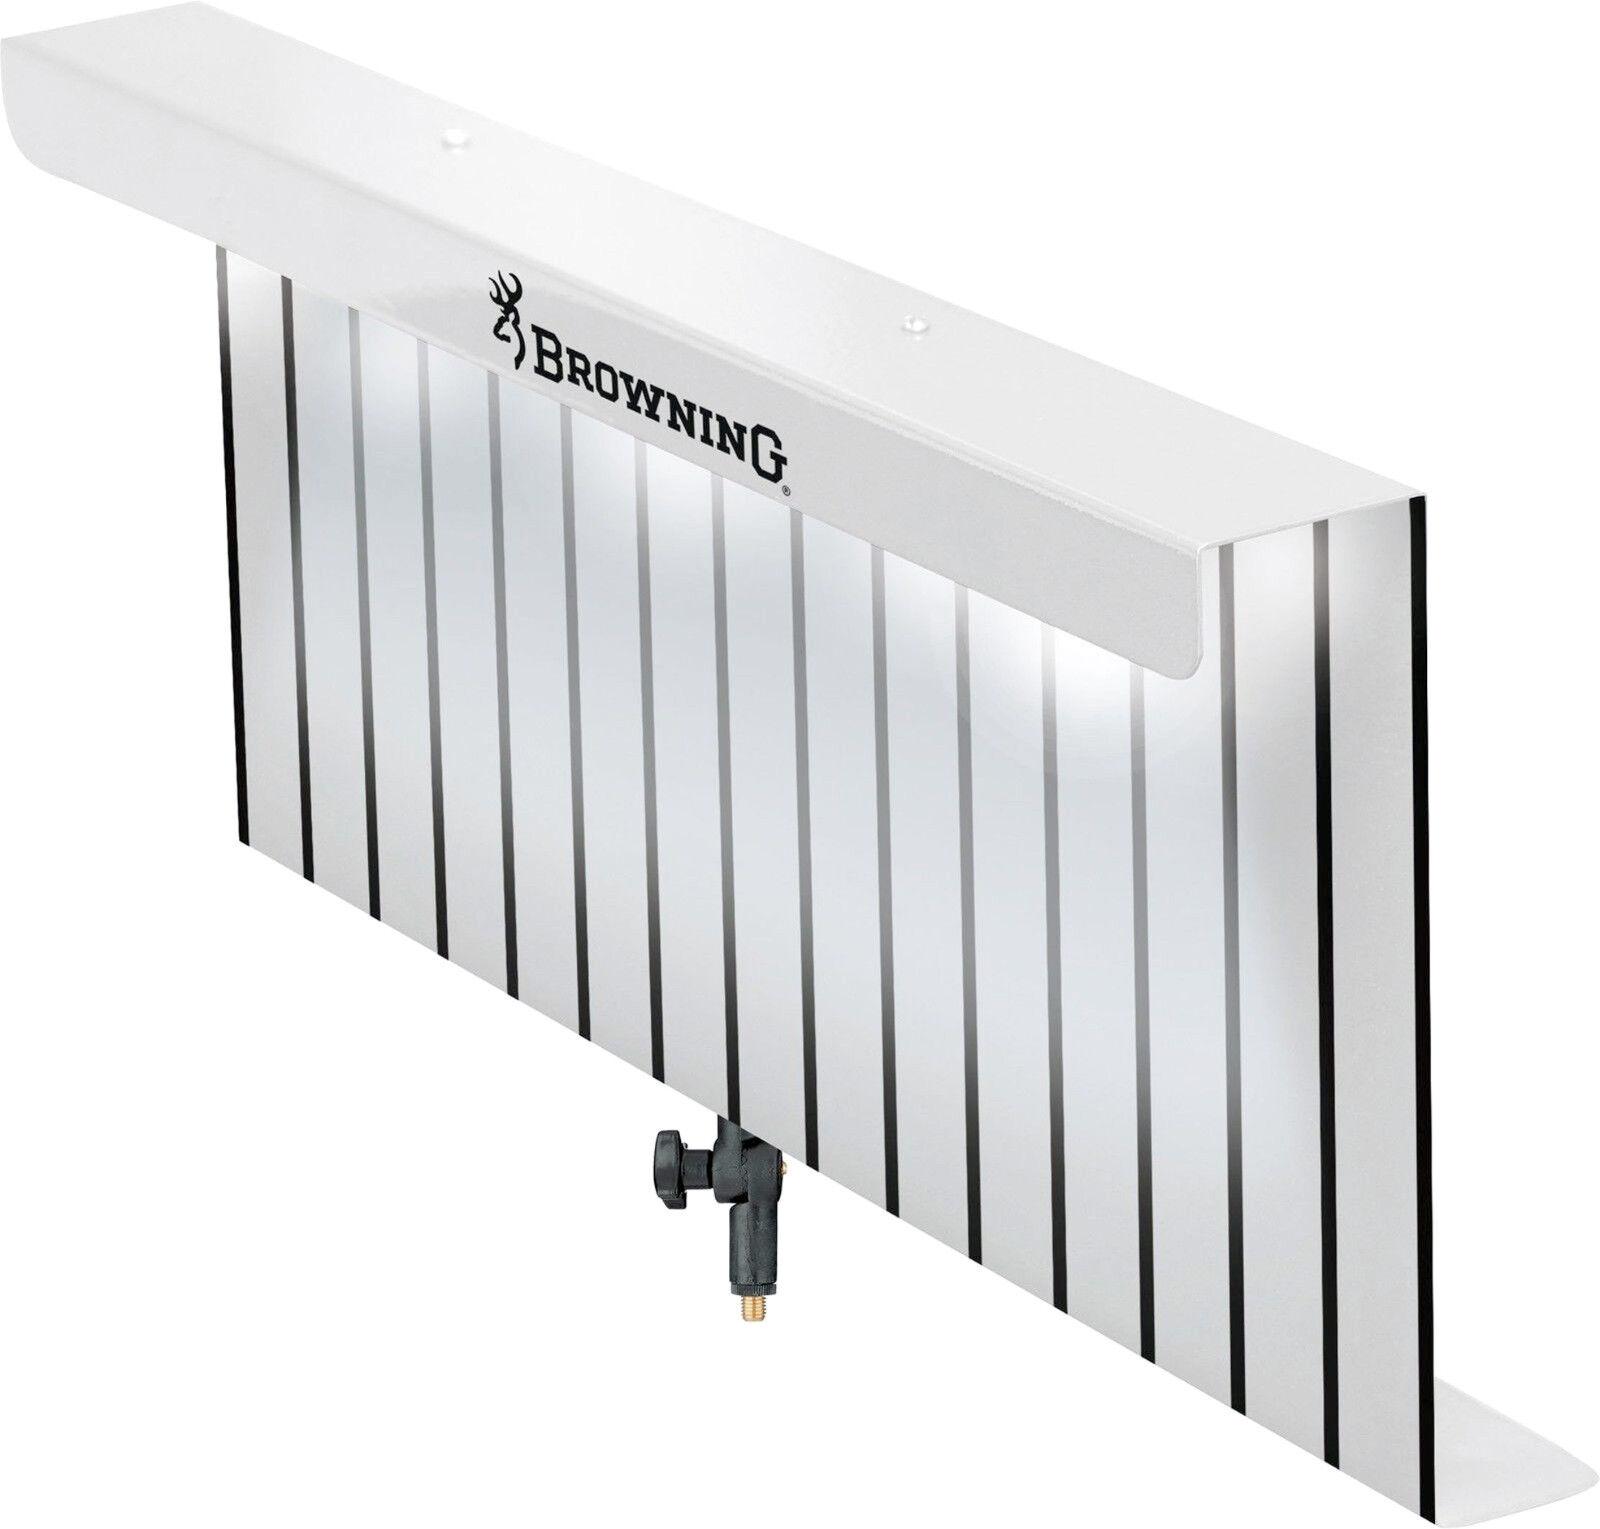 brauning TARGET BOARD, ILLUMINATED 31cm x 29cm feederboard, beleuchted,